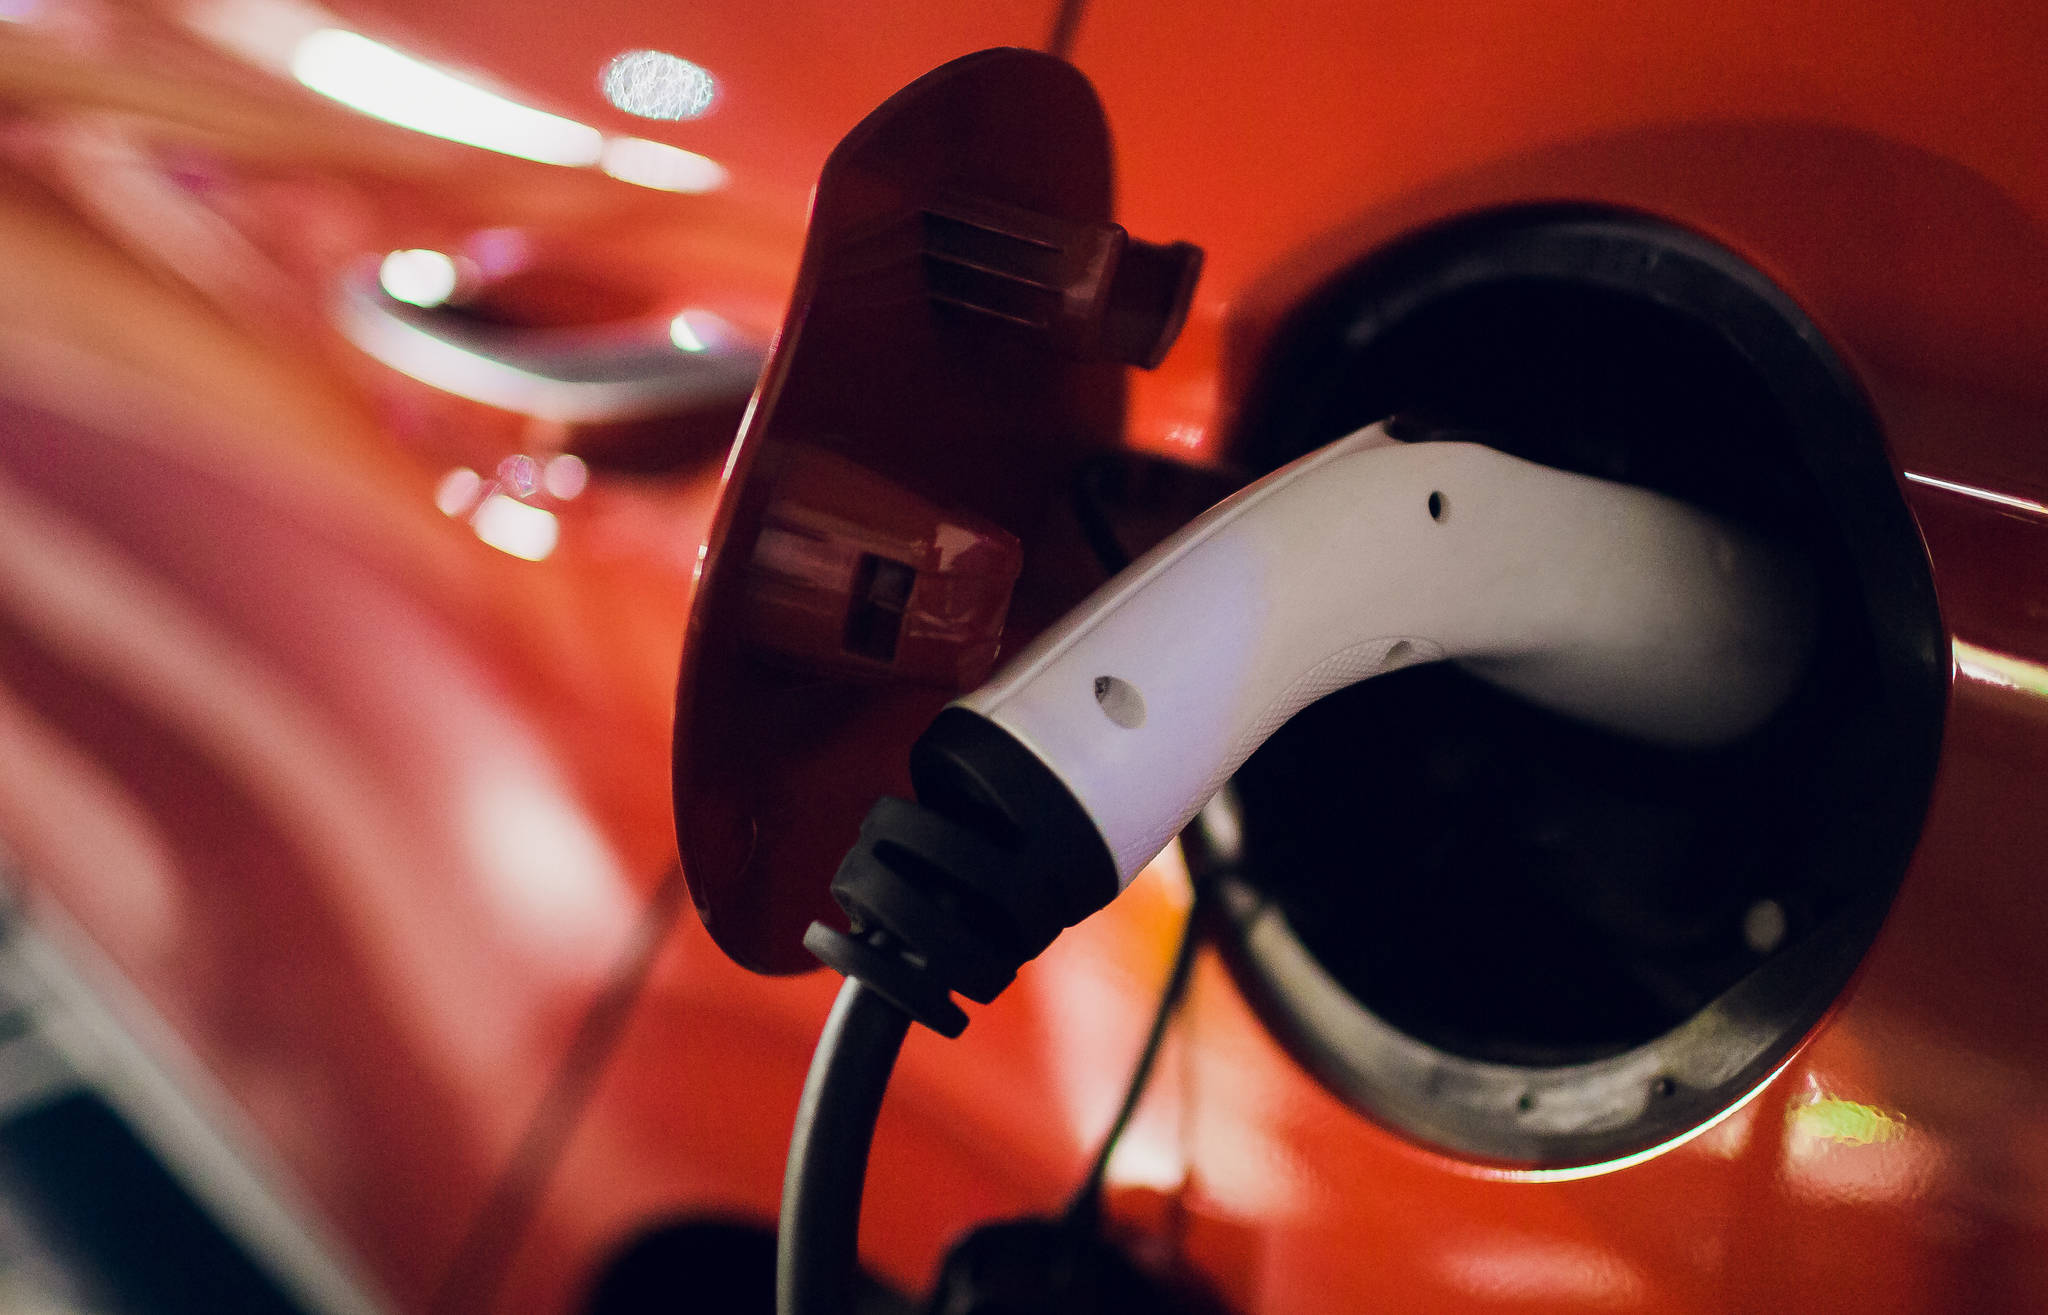 5 tips for EV winter driving